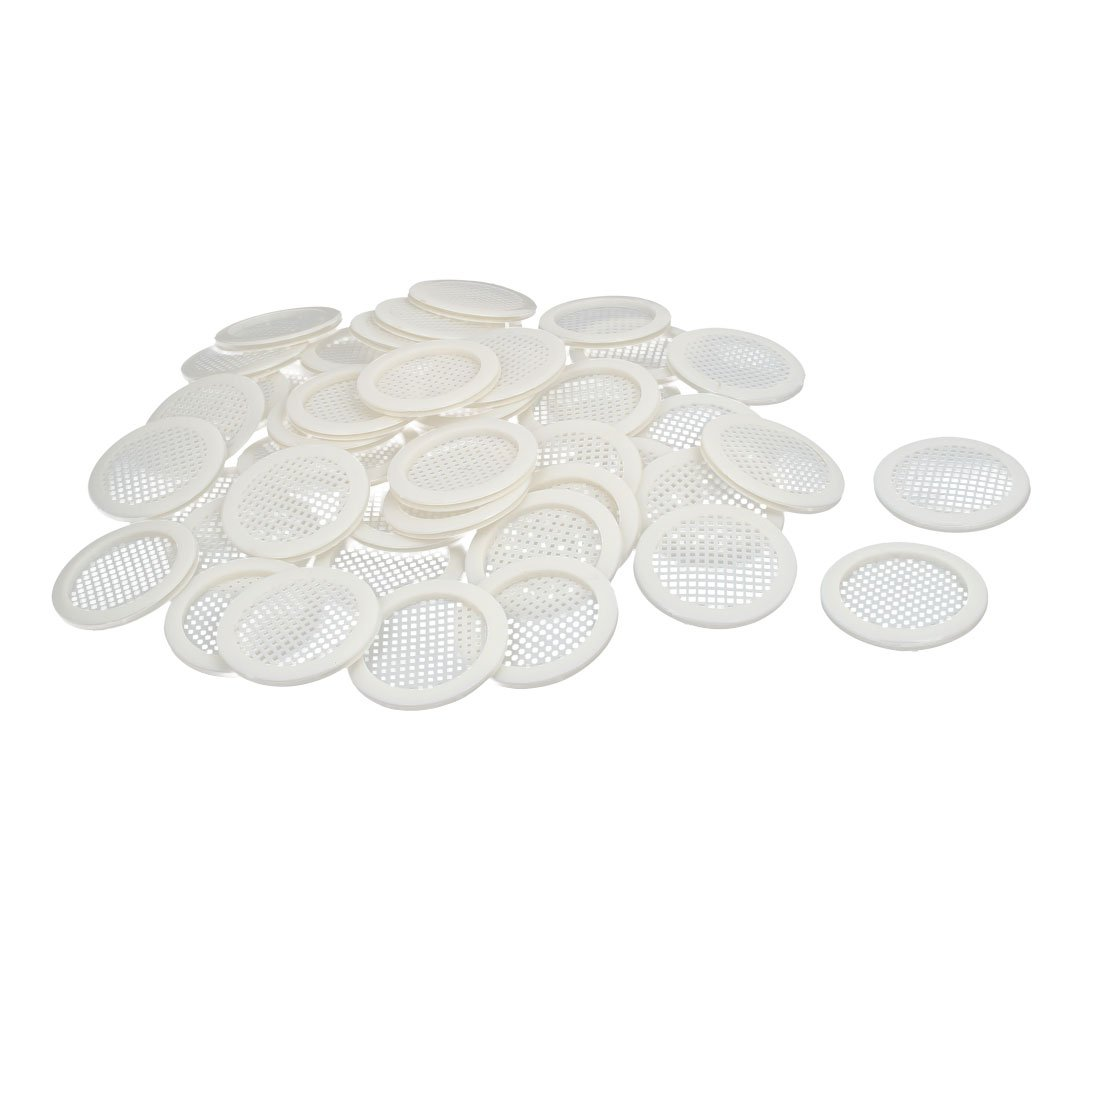 uxcell Shoes Cabinet 67mm Dia Plastic Square Mesh Hole Air Vent Louver Cover White 100pcs